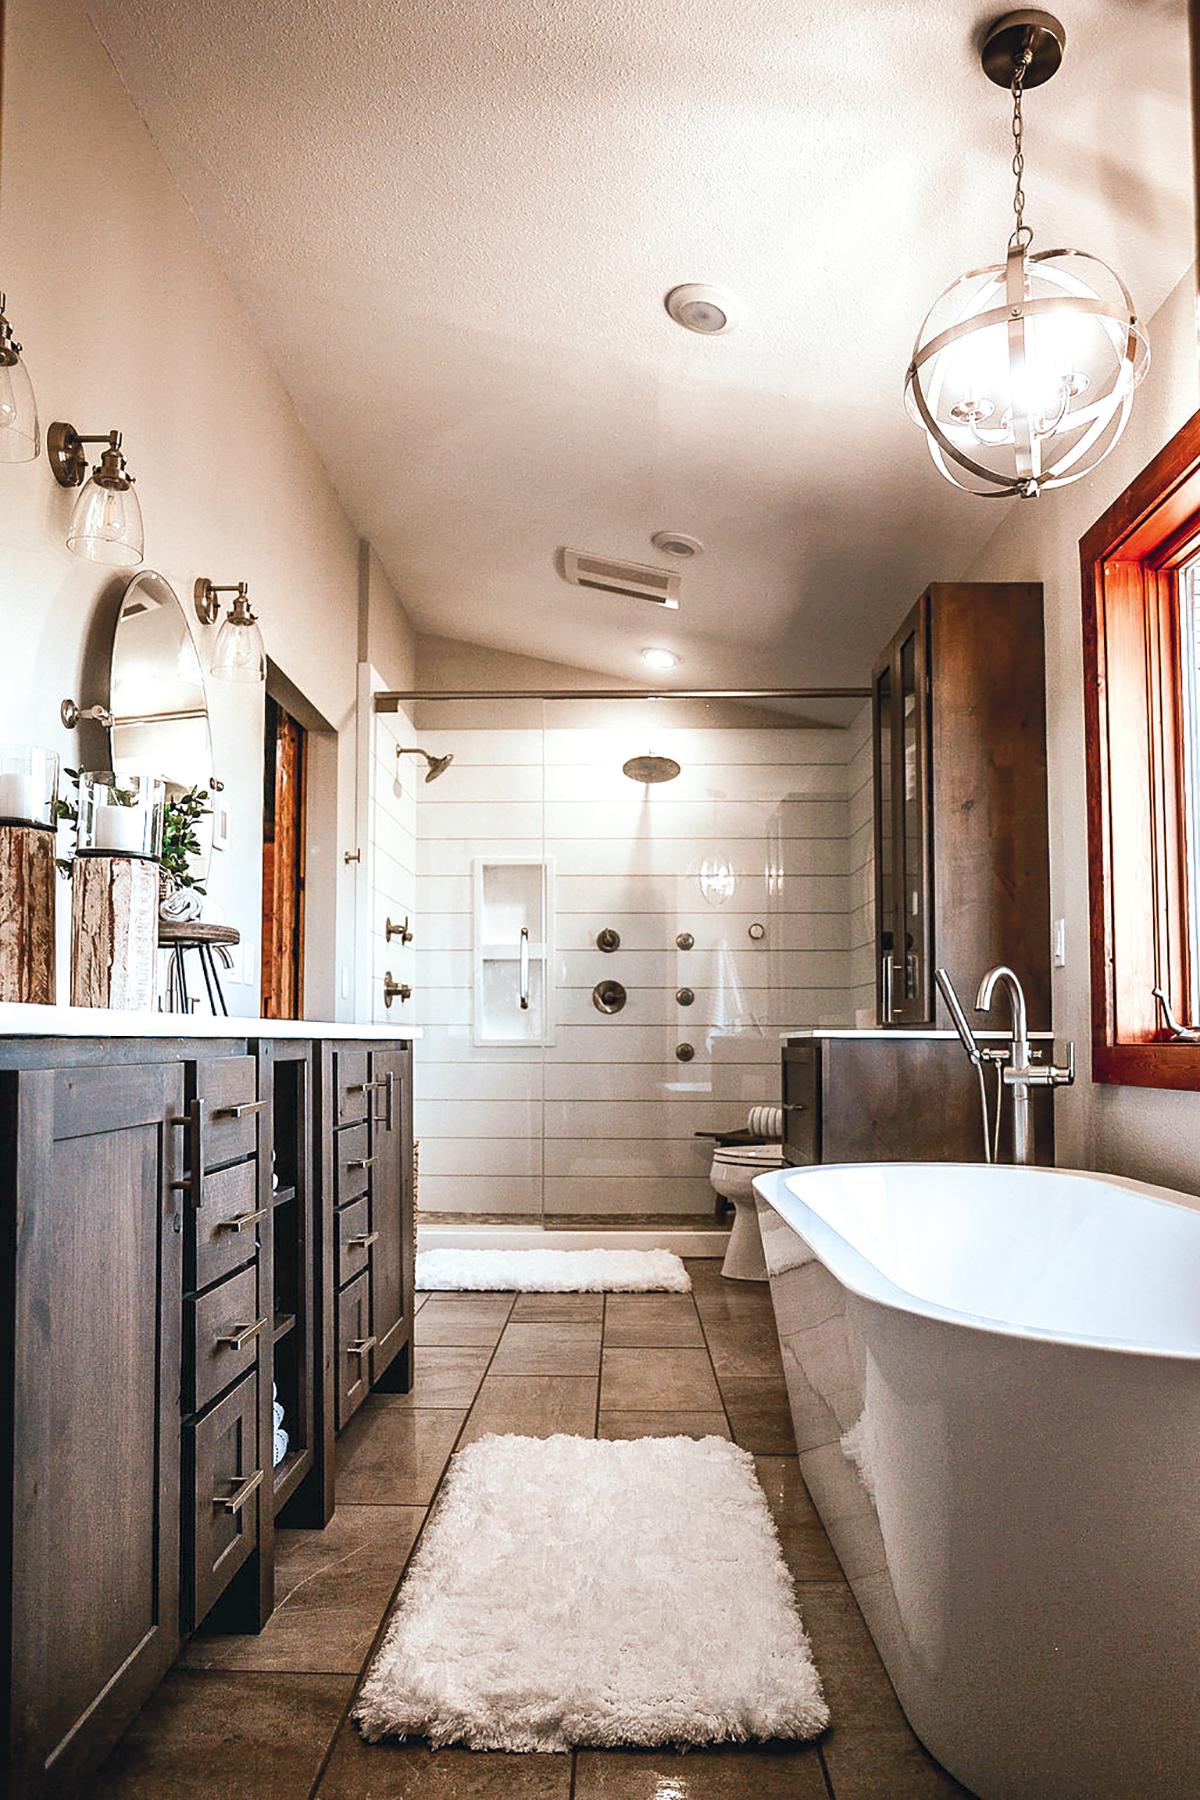 janice costa archives kitchen bath